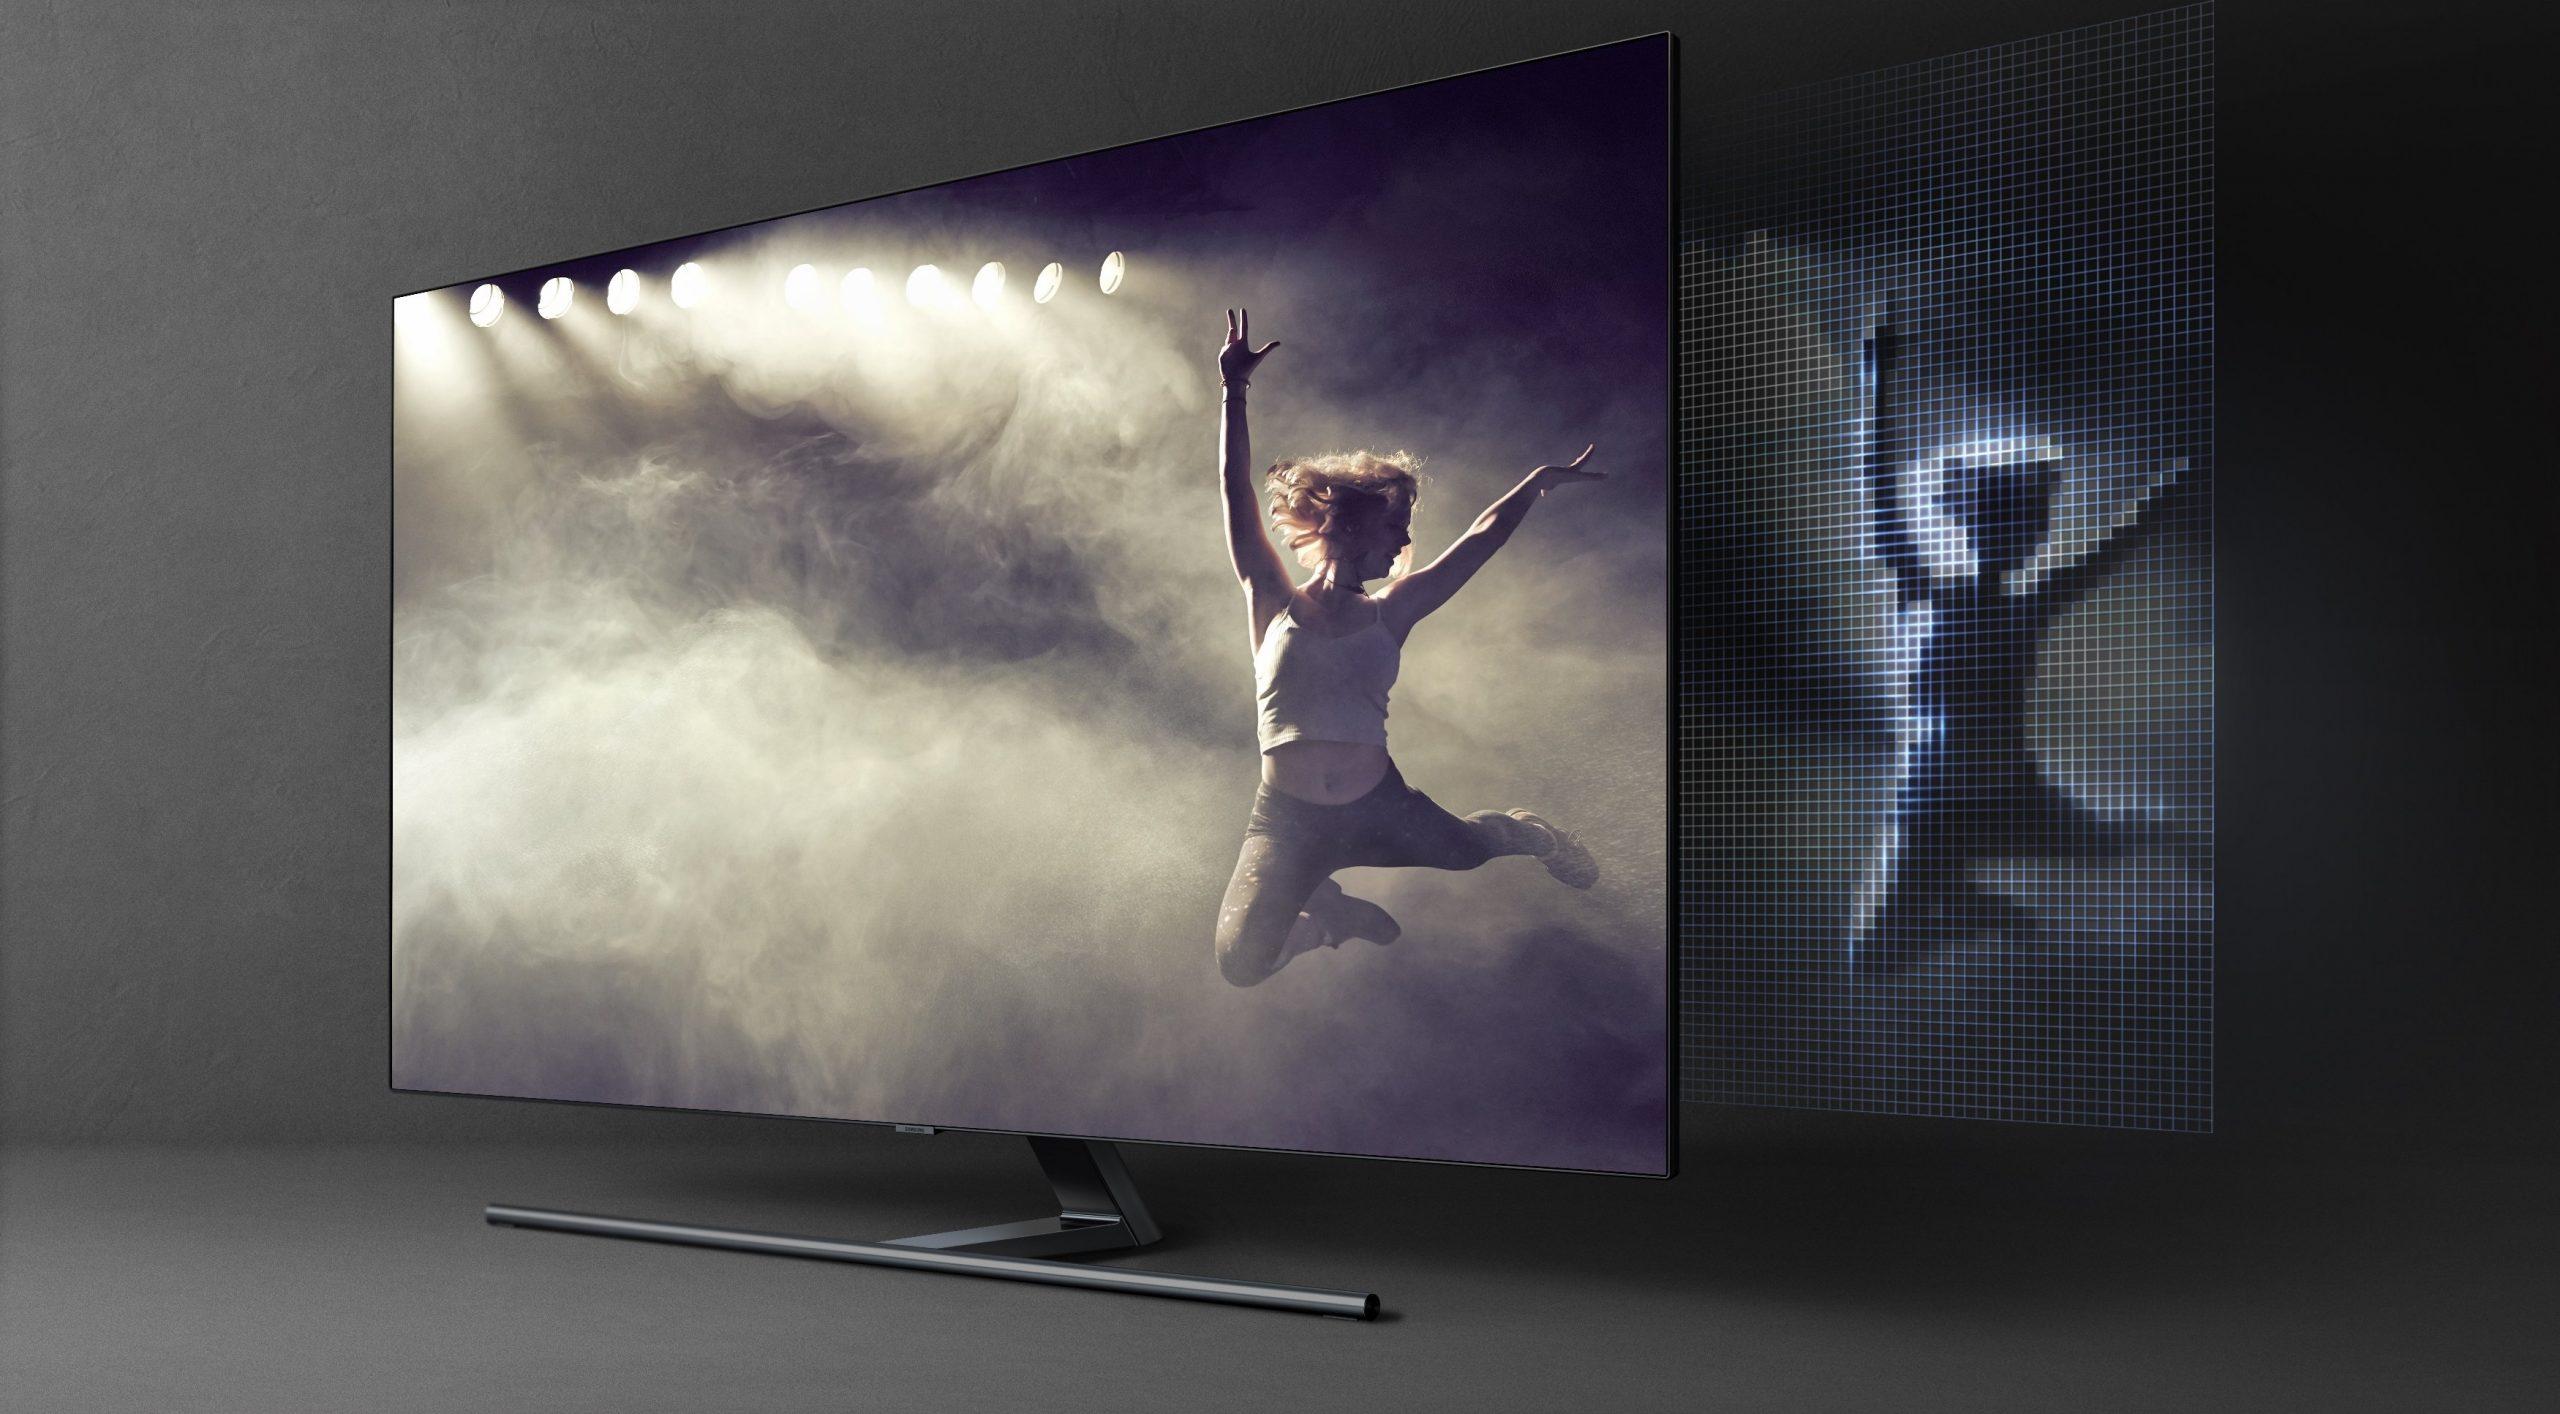 Full Review: Samsung Q9FN 65 inch Smart QLED TV | LiveatPC